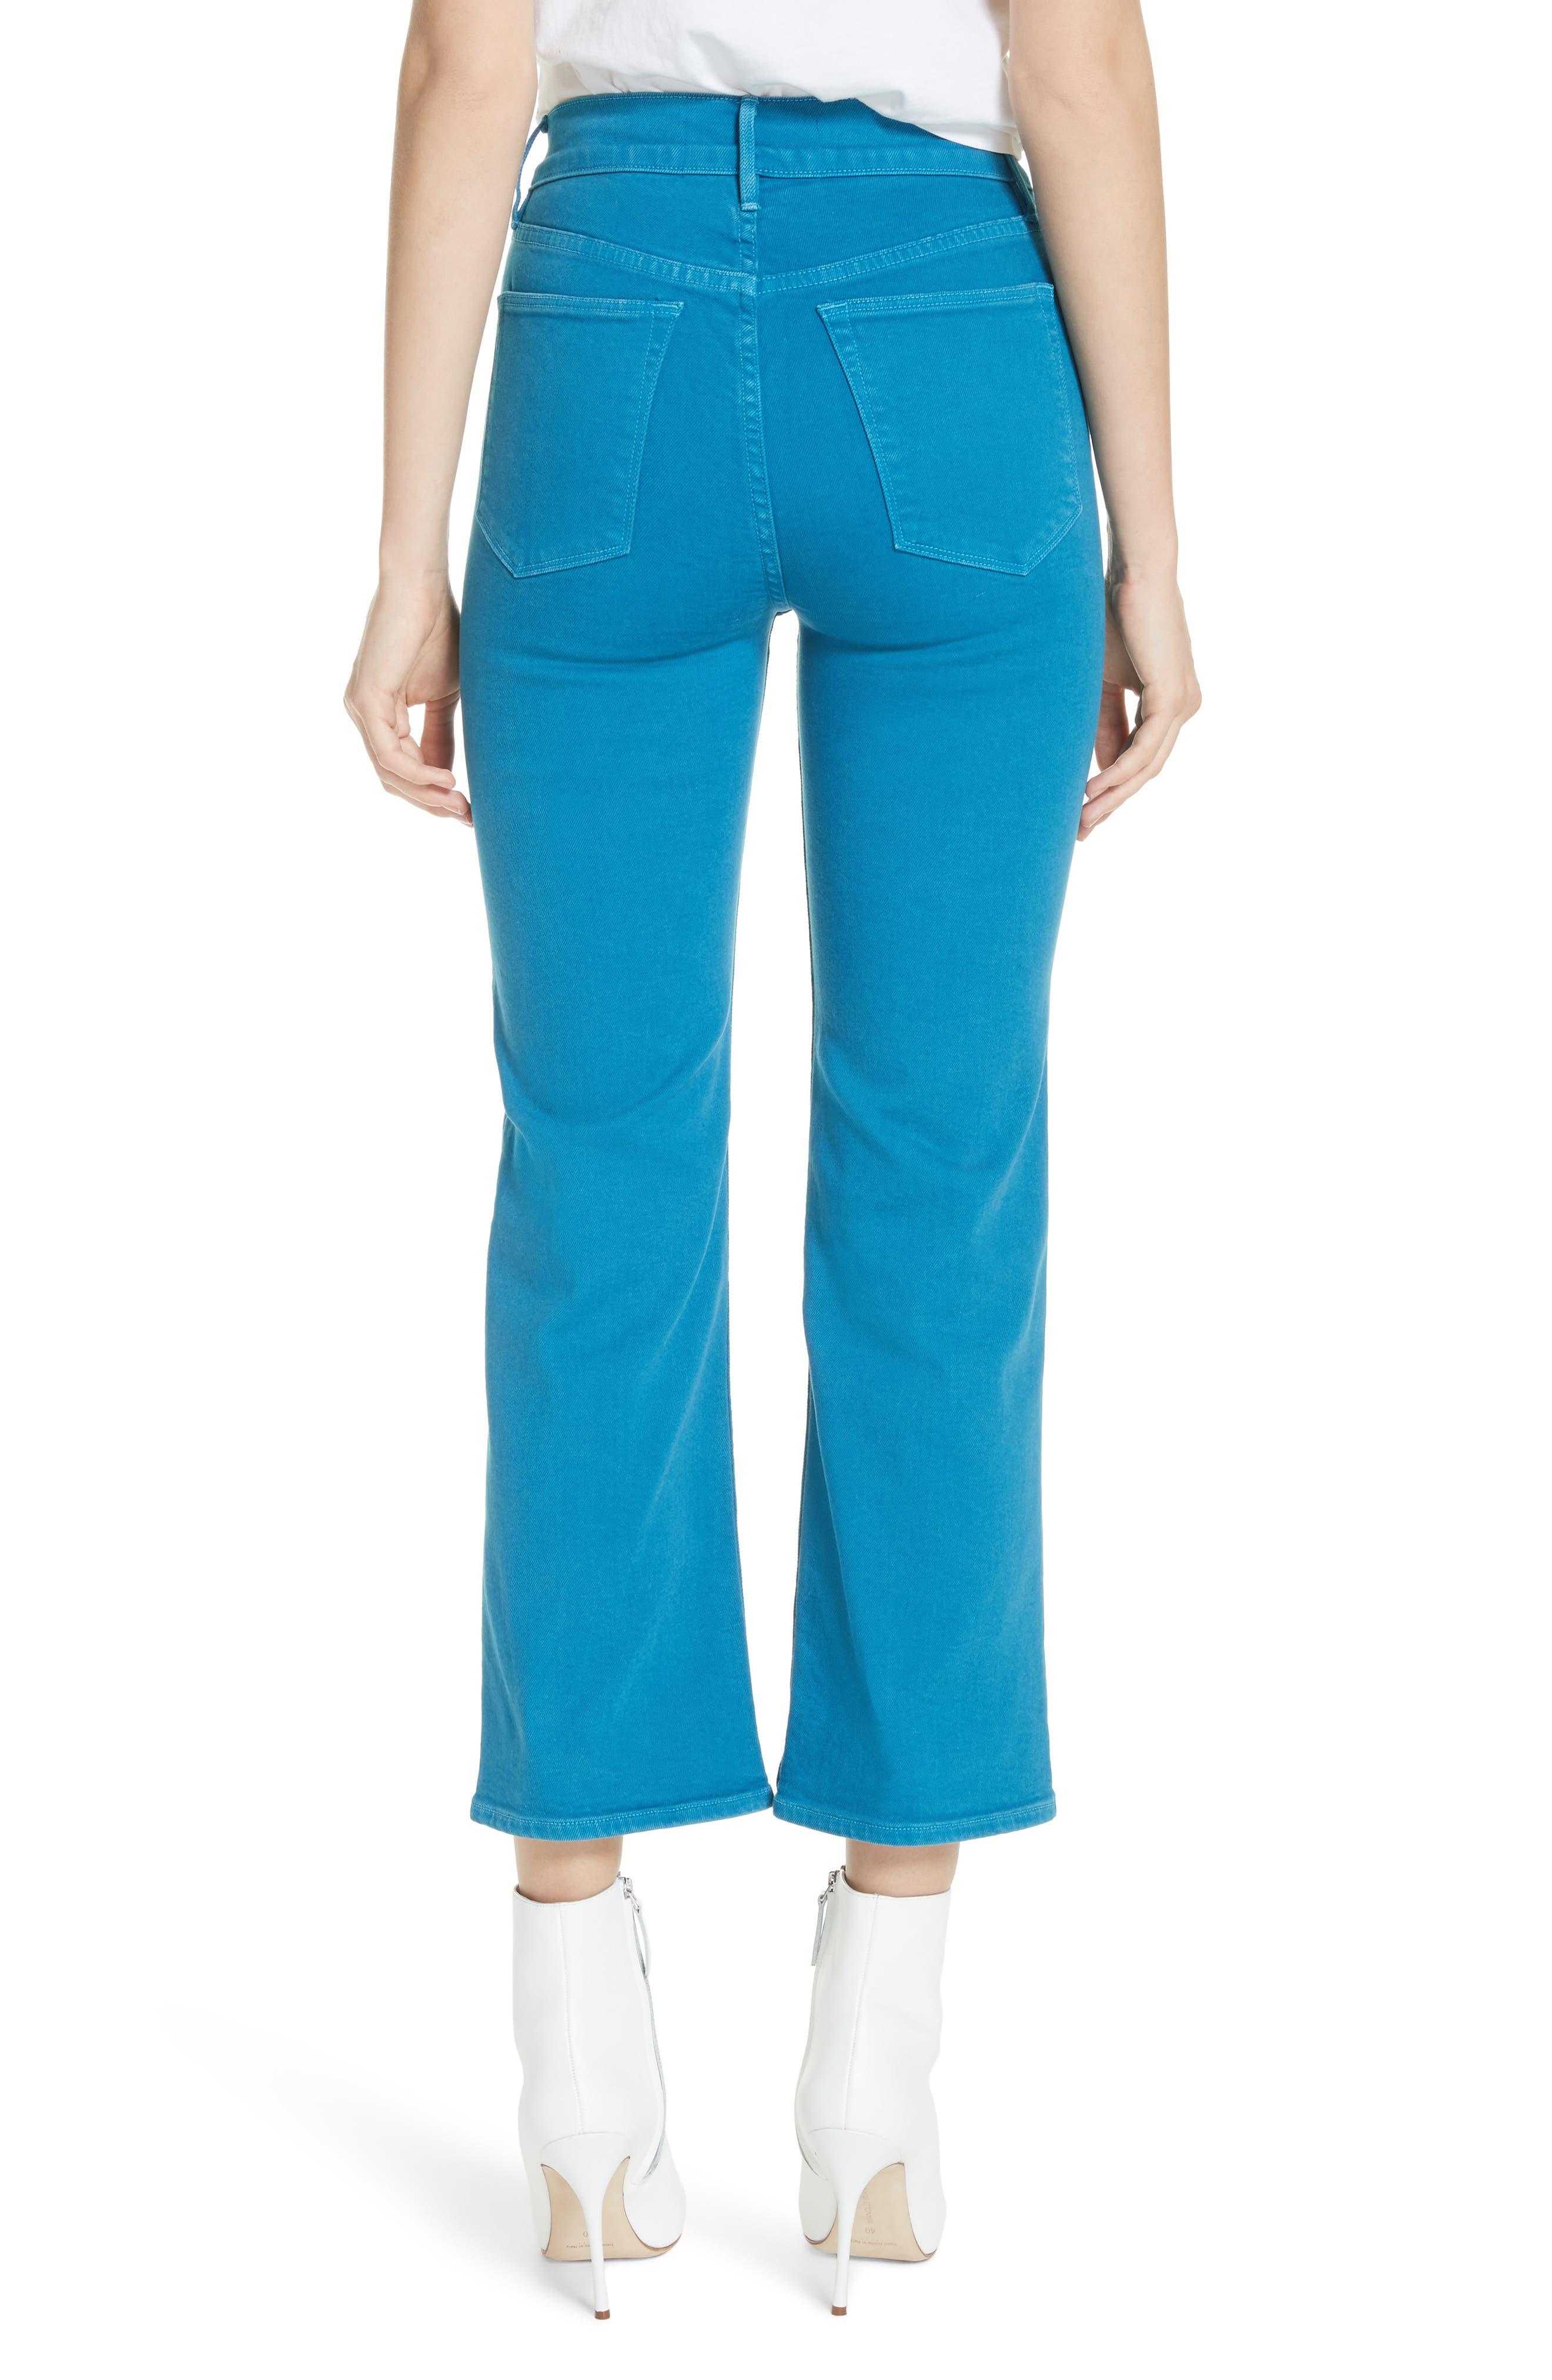 W4 Shelter Wide Leg Crop Jeans,                             Alternate thumbnail 2, color,                             Peacock Blue